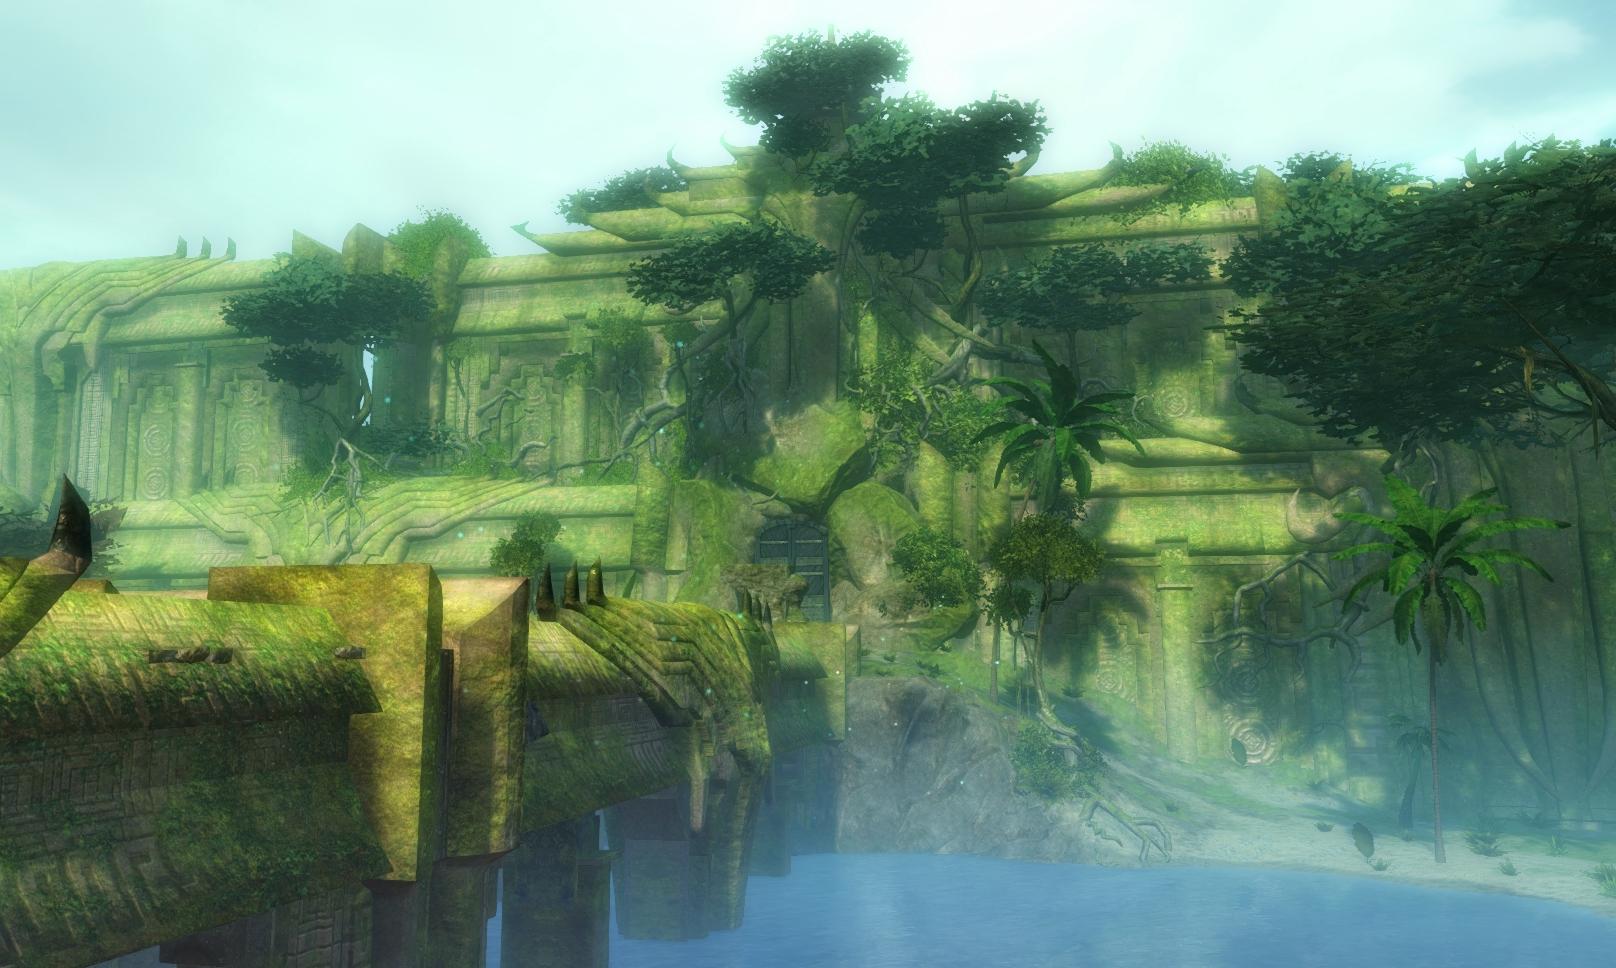 Guild Wars 2 - Vistas in Caledon Forest - 08 Ventry Bay